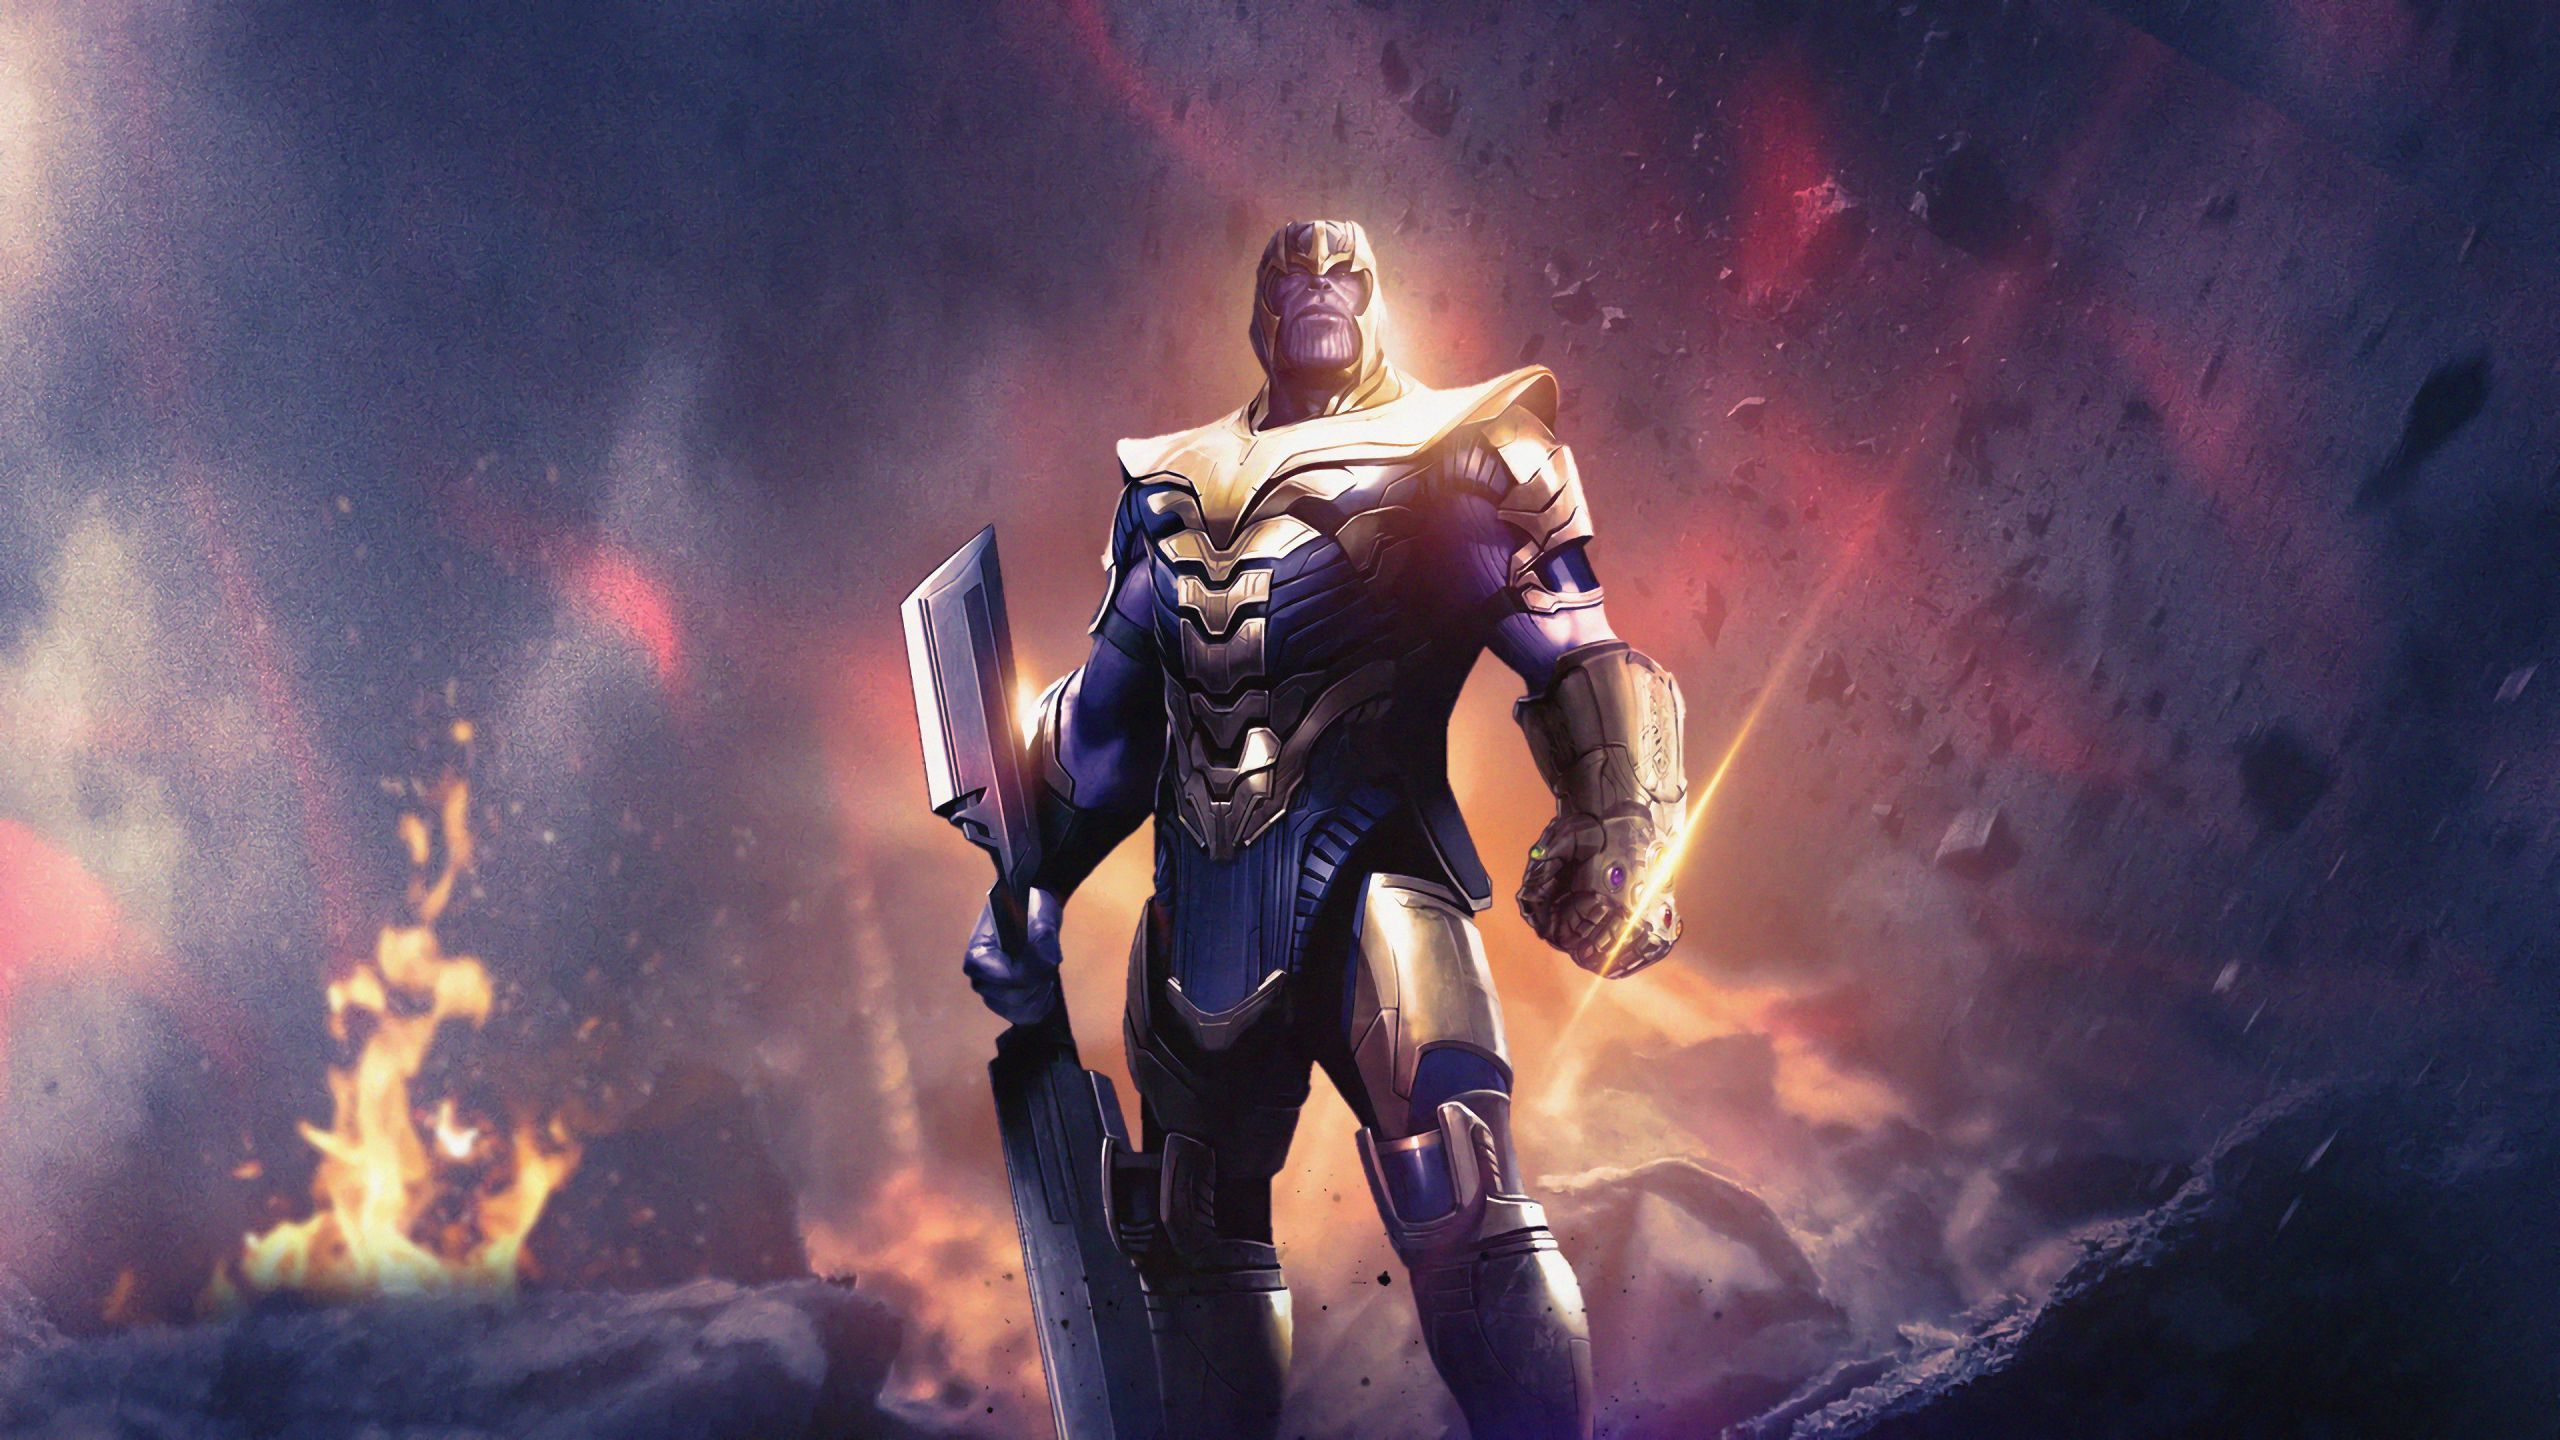 Avengers Endgame Wallpaper Inspirational Avengers Endgame Thanos Weapon Wallpaper 4k Ultra Hd In 2020 Avengers Movies Hd Movies